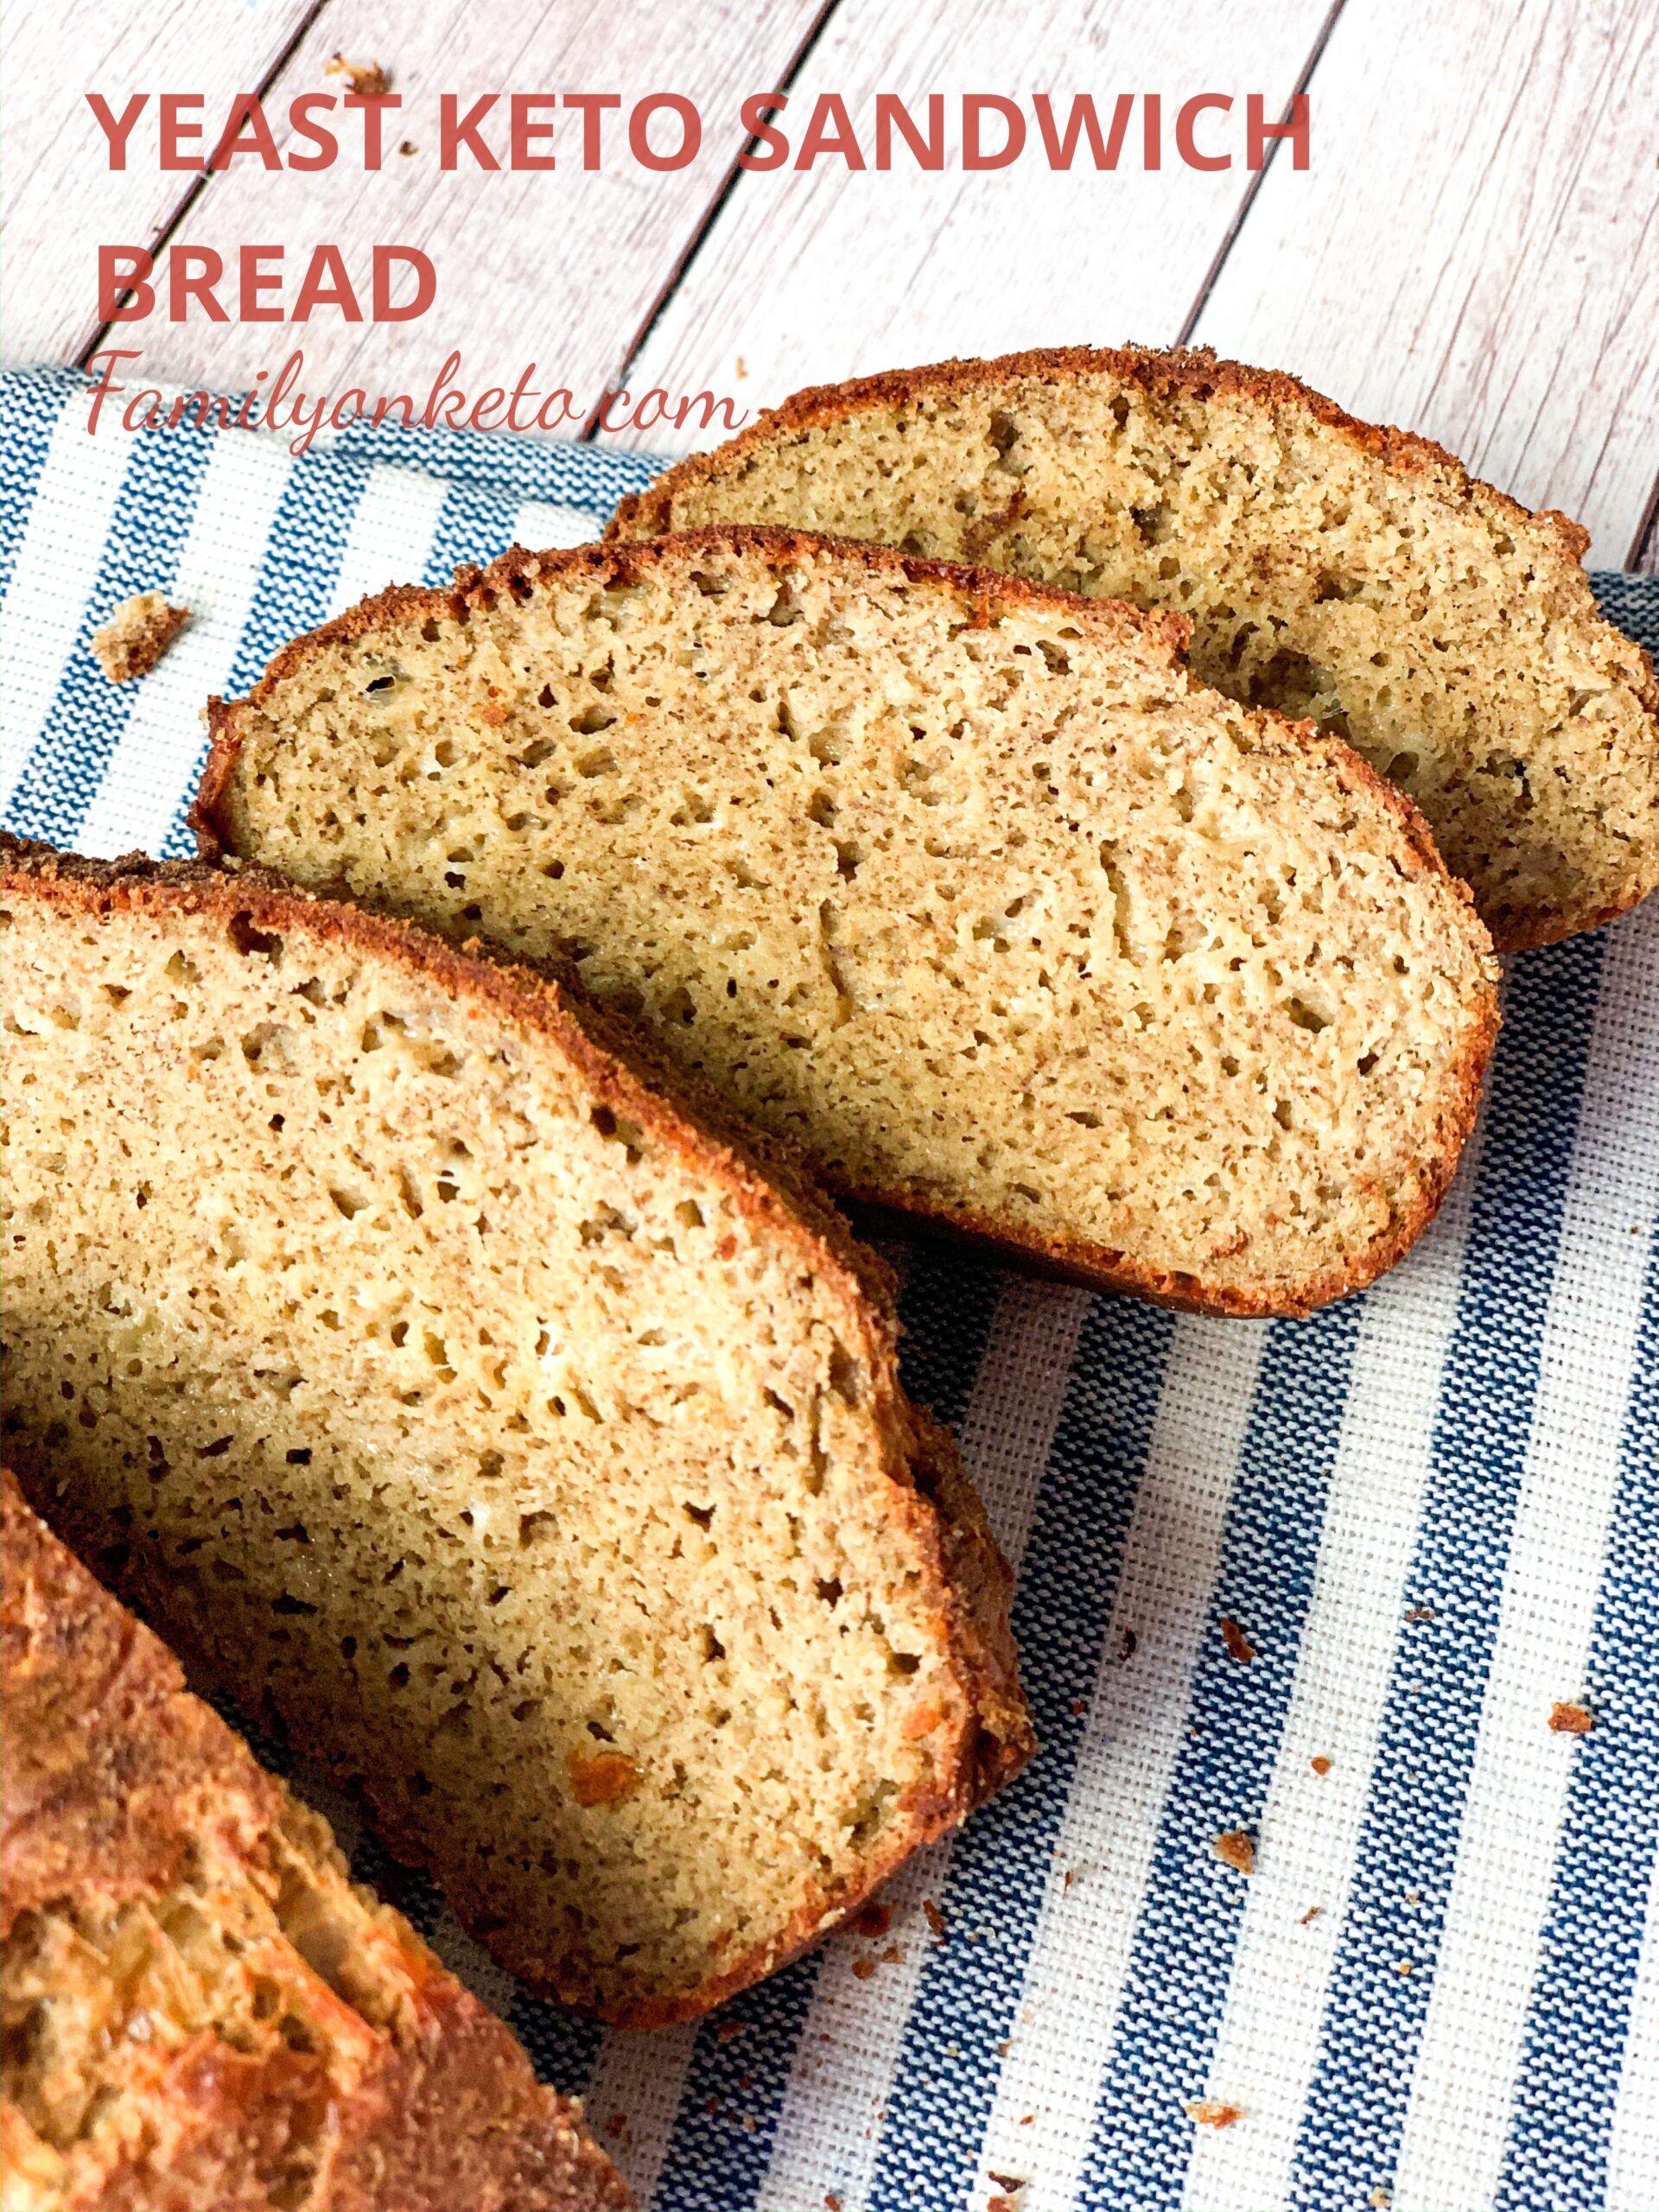 Yeast keto sandwich bread | Recipe in 2020 | Low carb ...